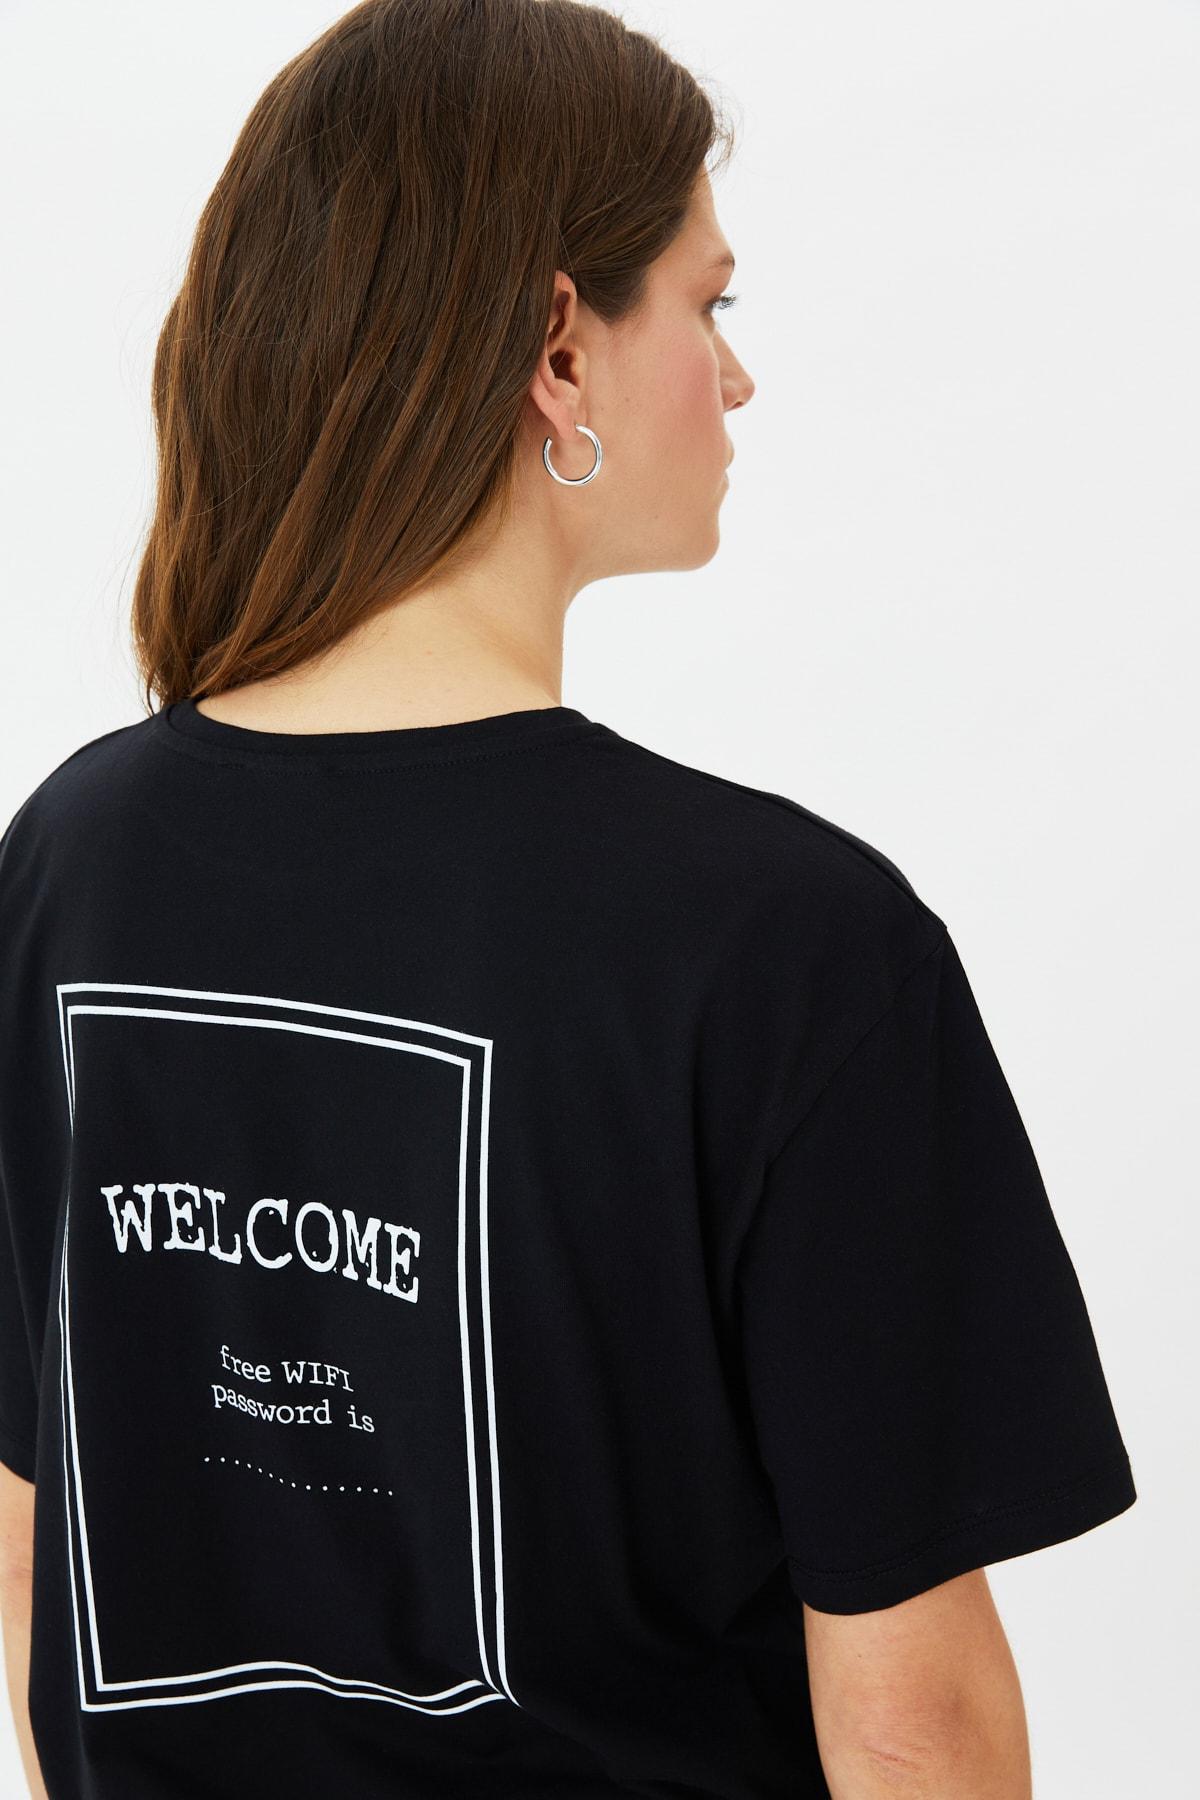 خرید ارزان تیشرت فانتزی زنانه مارک ترندیول میلا رنگ مشکی کد ty101290976